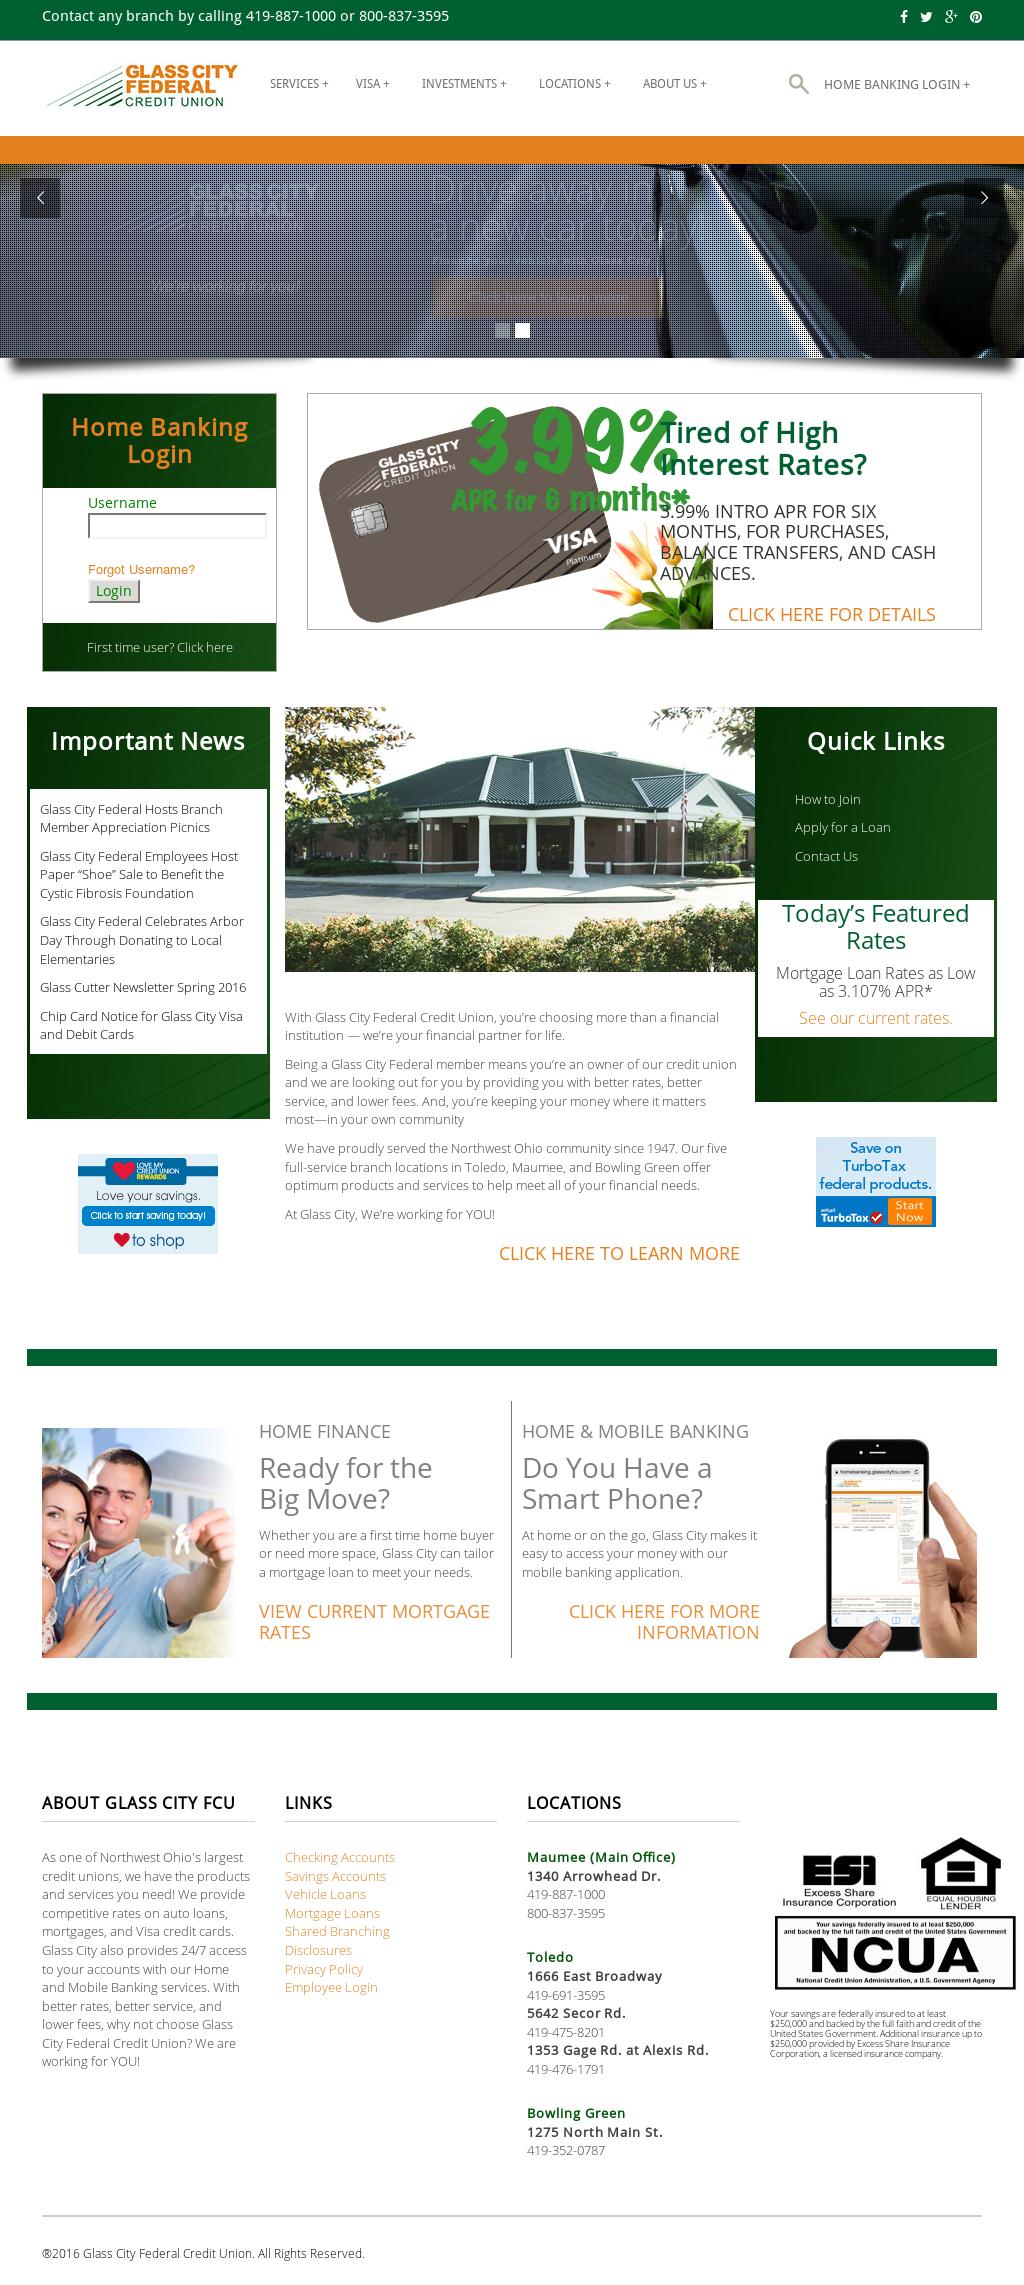 Glasscityfcu Competitors Revenue And Employees Owler Company Profile